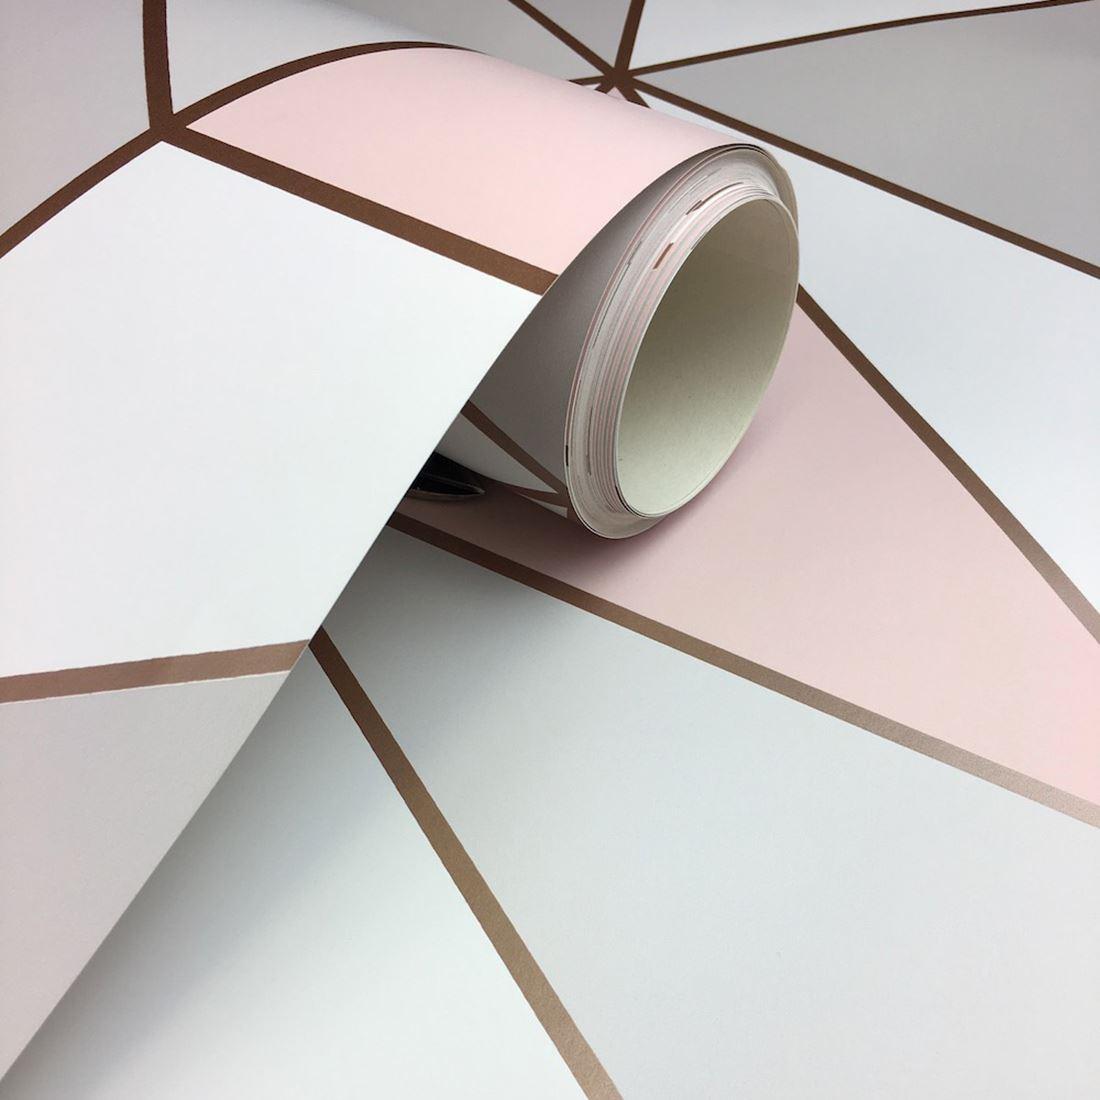 miniatura 16 - Carta da Parati Geometrica Arredamento Camera Moderno Vari Disegni e Colori